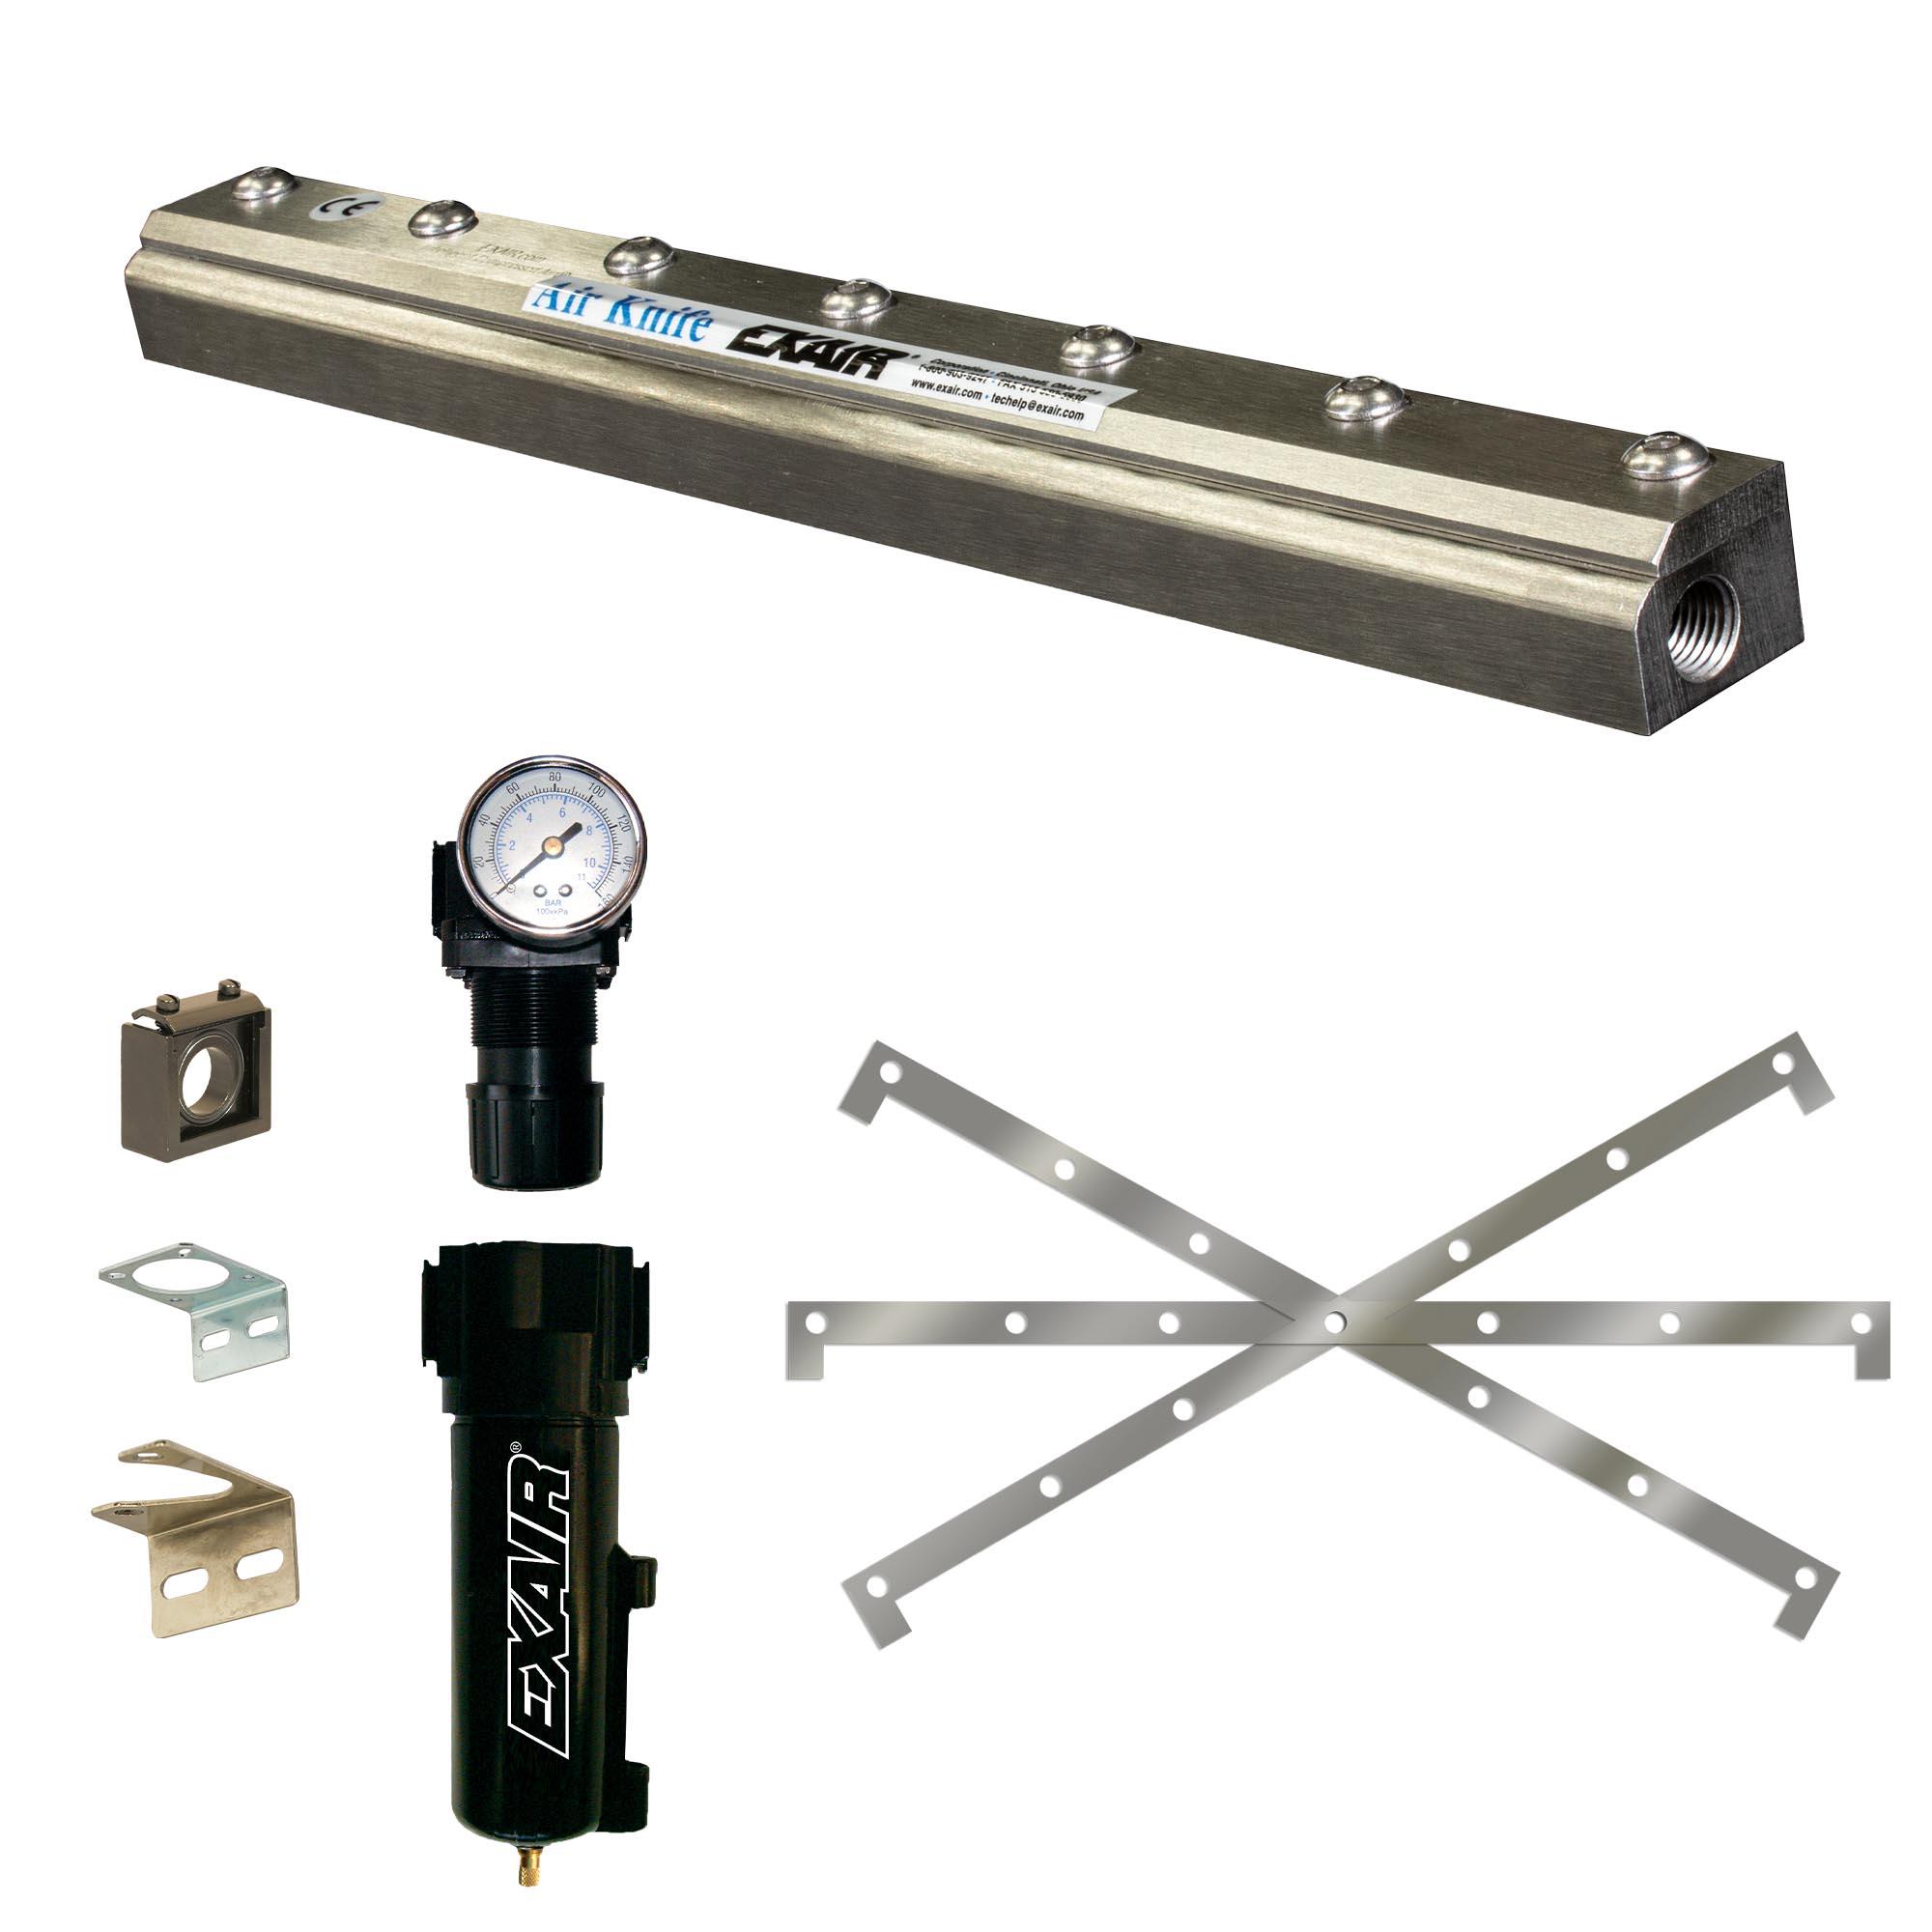 Stainless Steel Standard Air Knife Kit